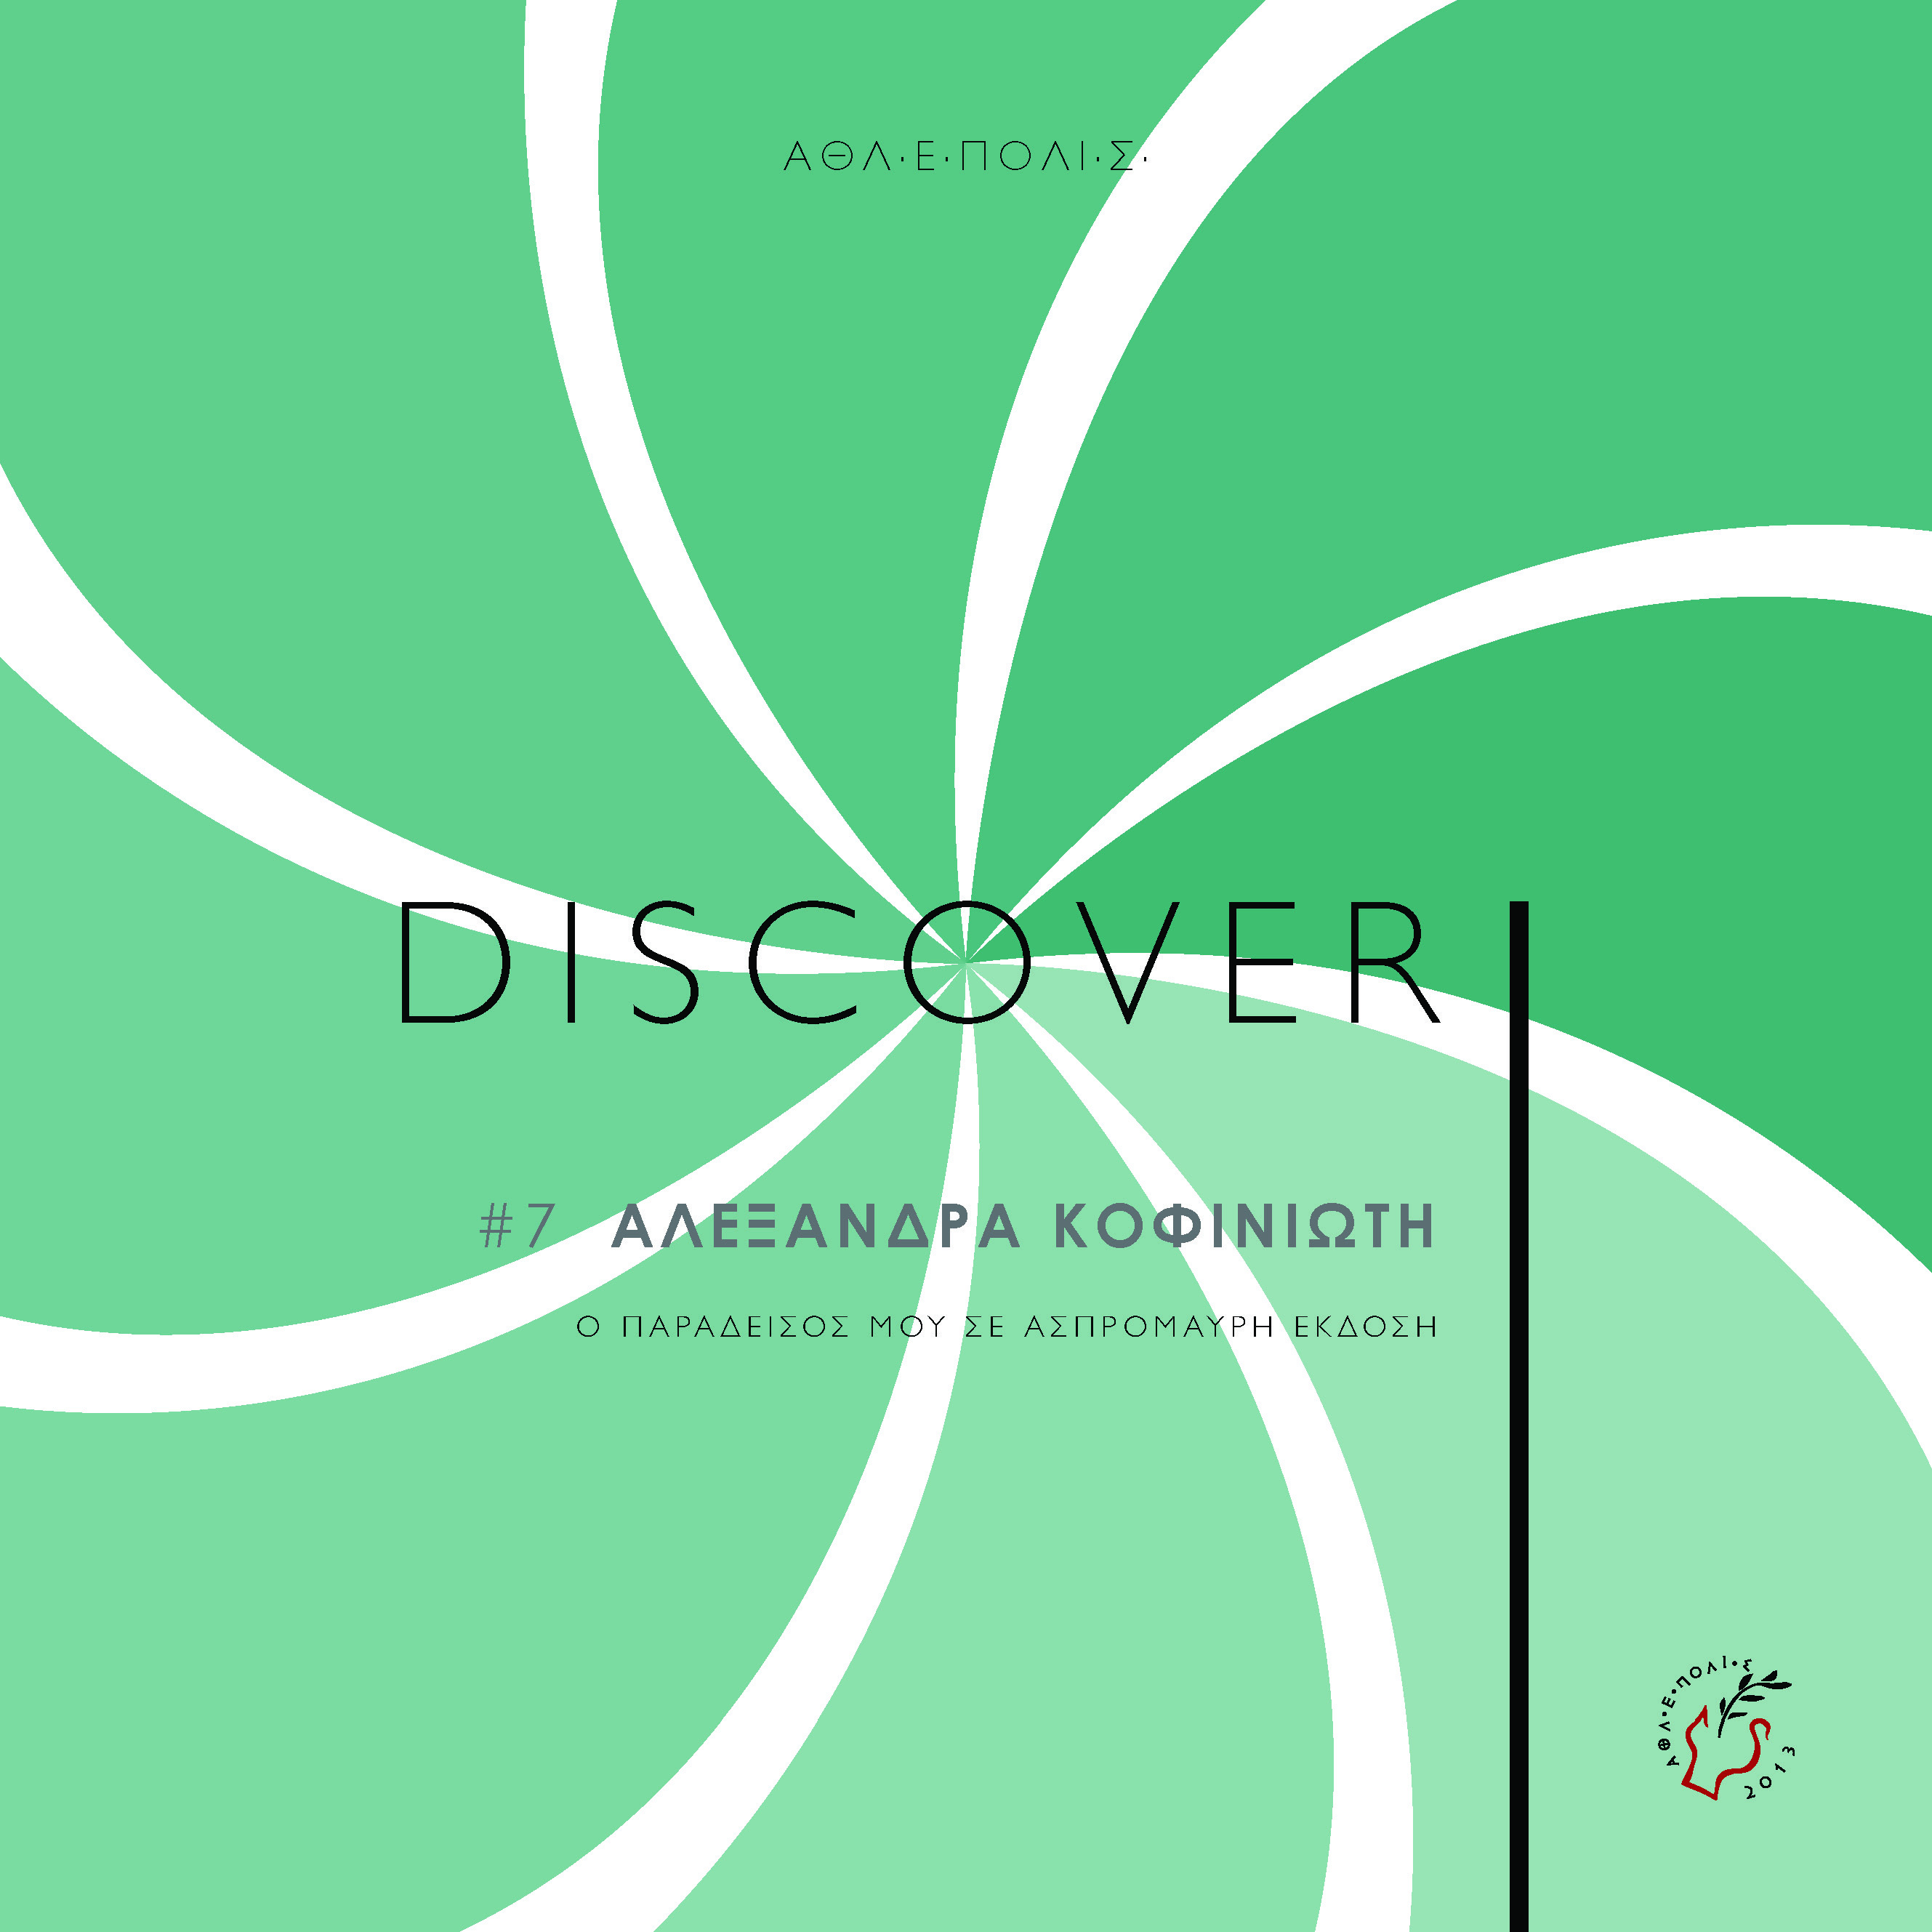 DISCOVER #7 Aleksandra Kofiniwti Cover